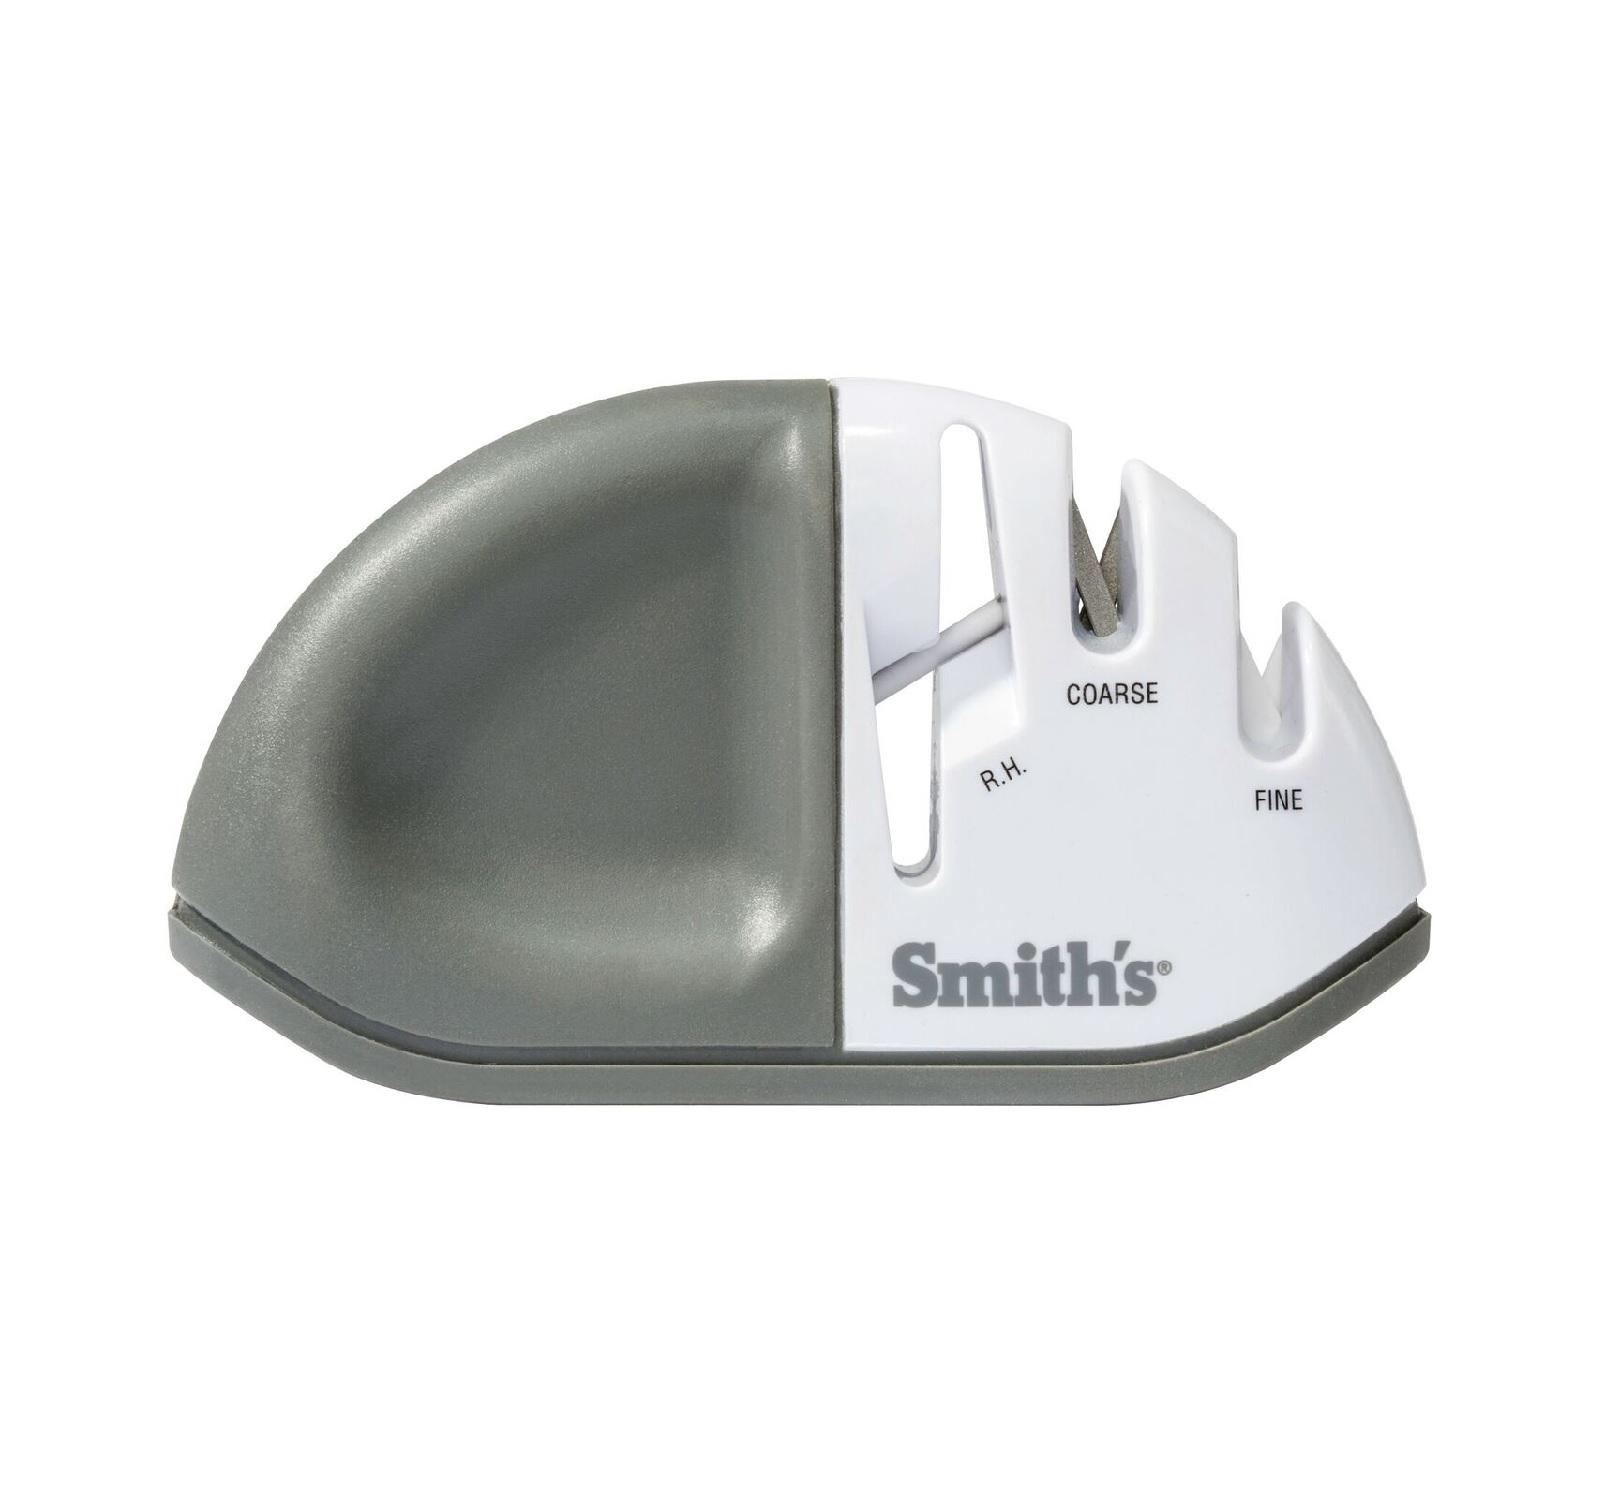 Smith Diamond Edge Grip Max Knife and Scissors Sharpener